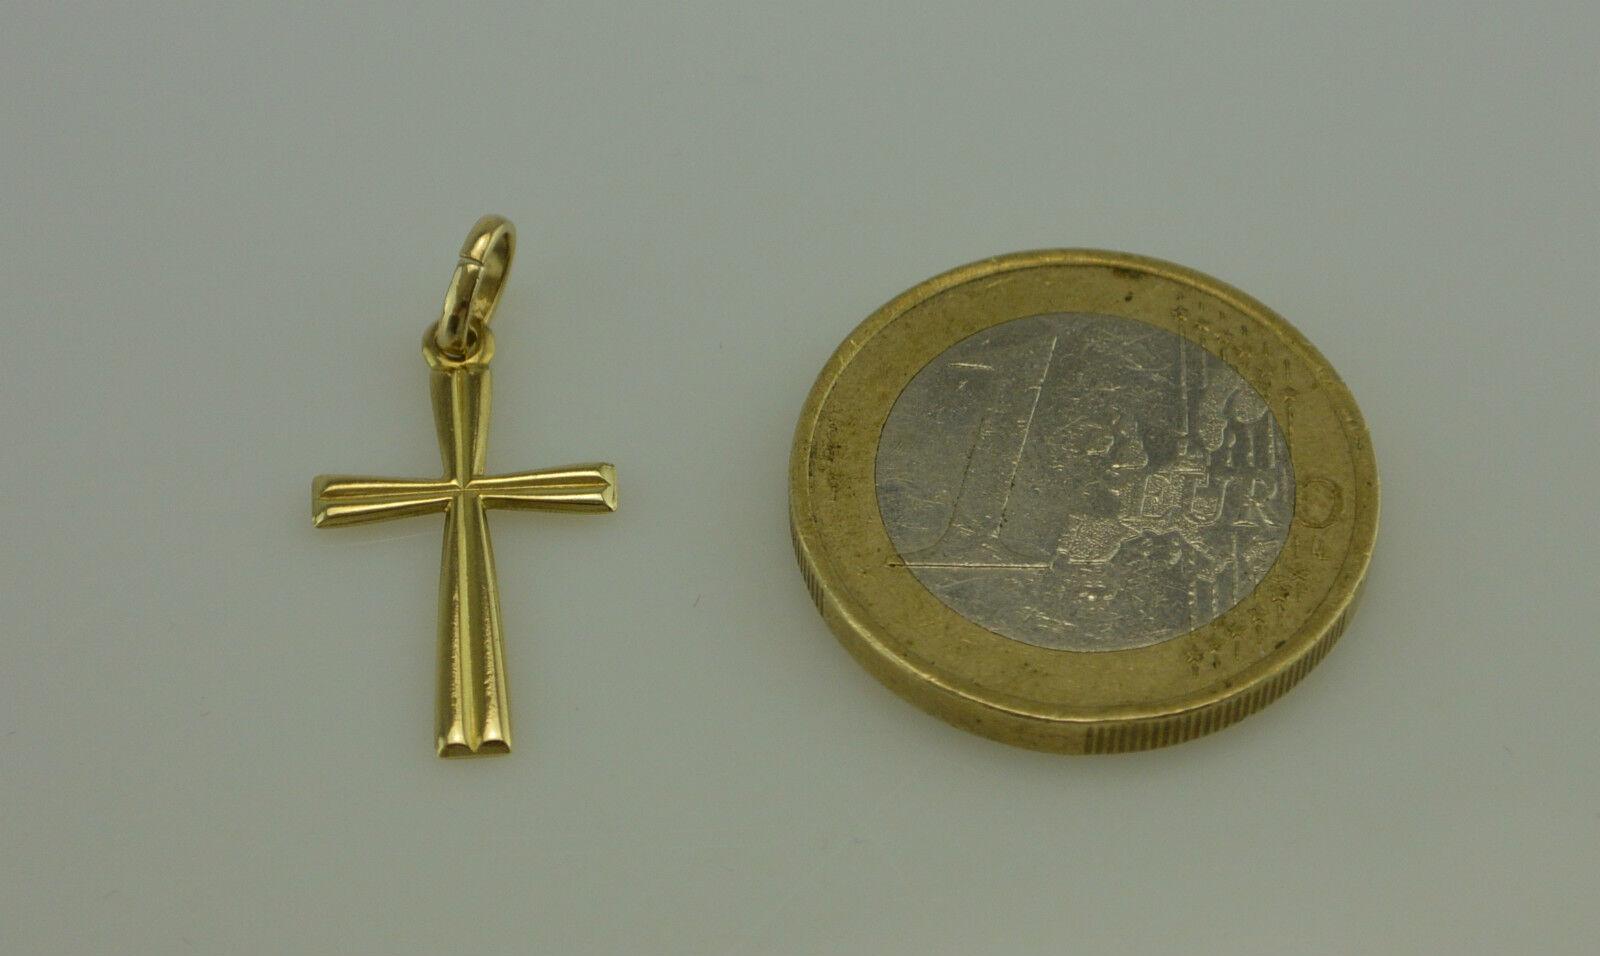 Semplice & Elegante Croce Croce Croce 333er - 8 carati giallo 8edb46